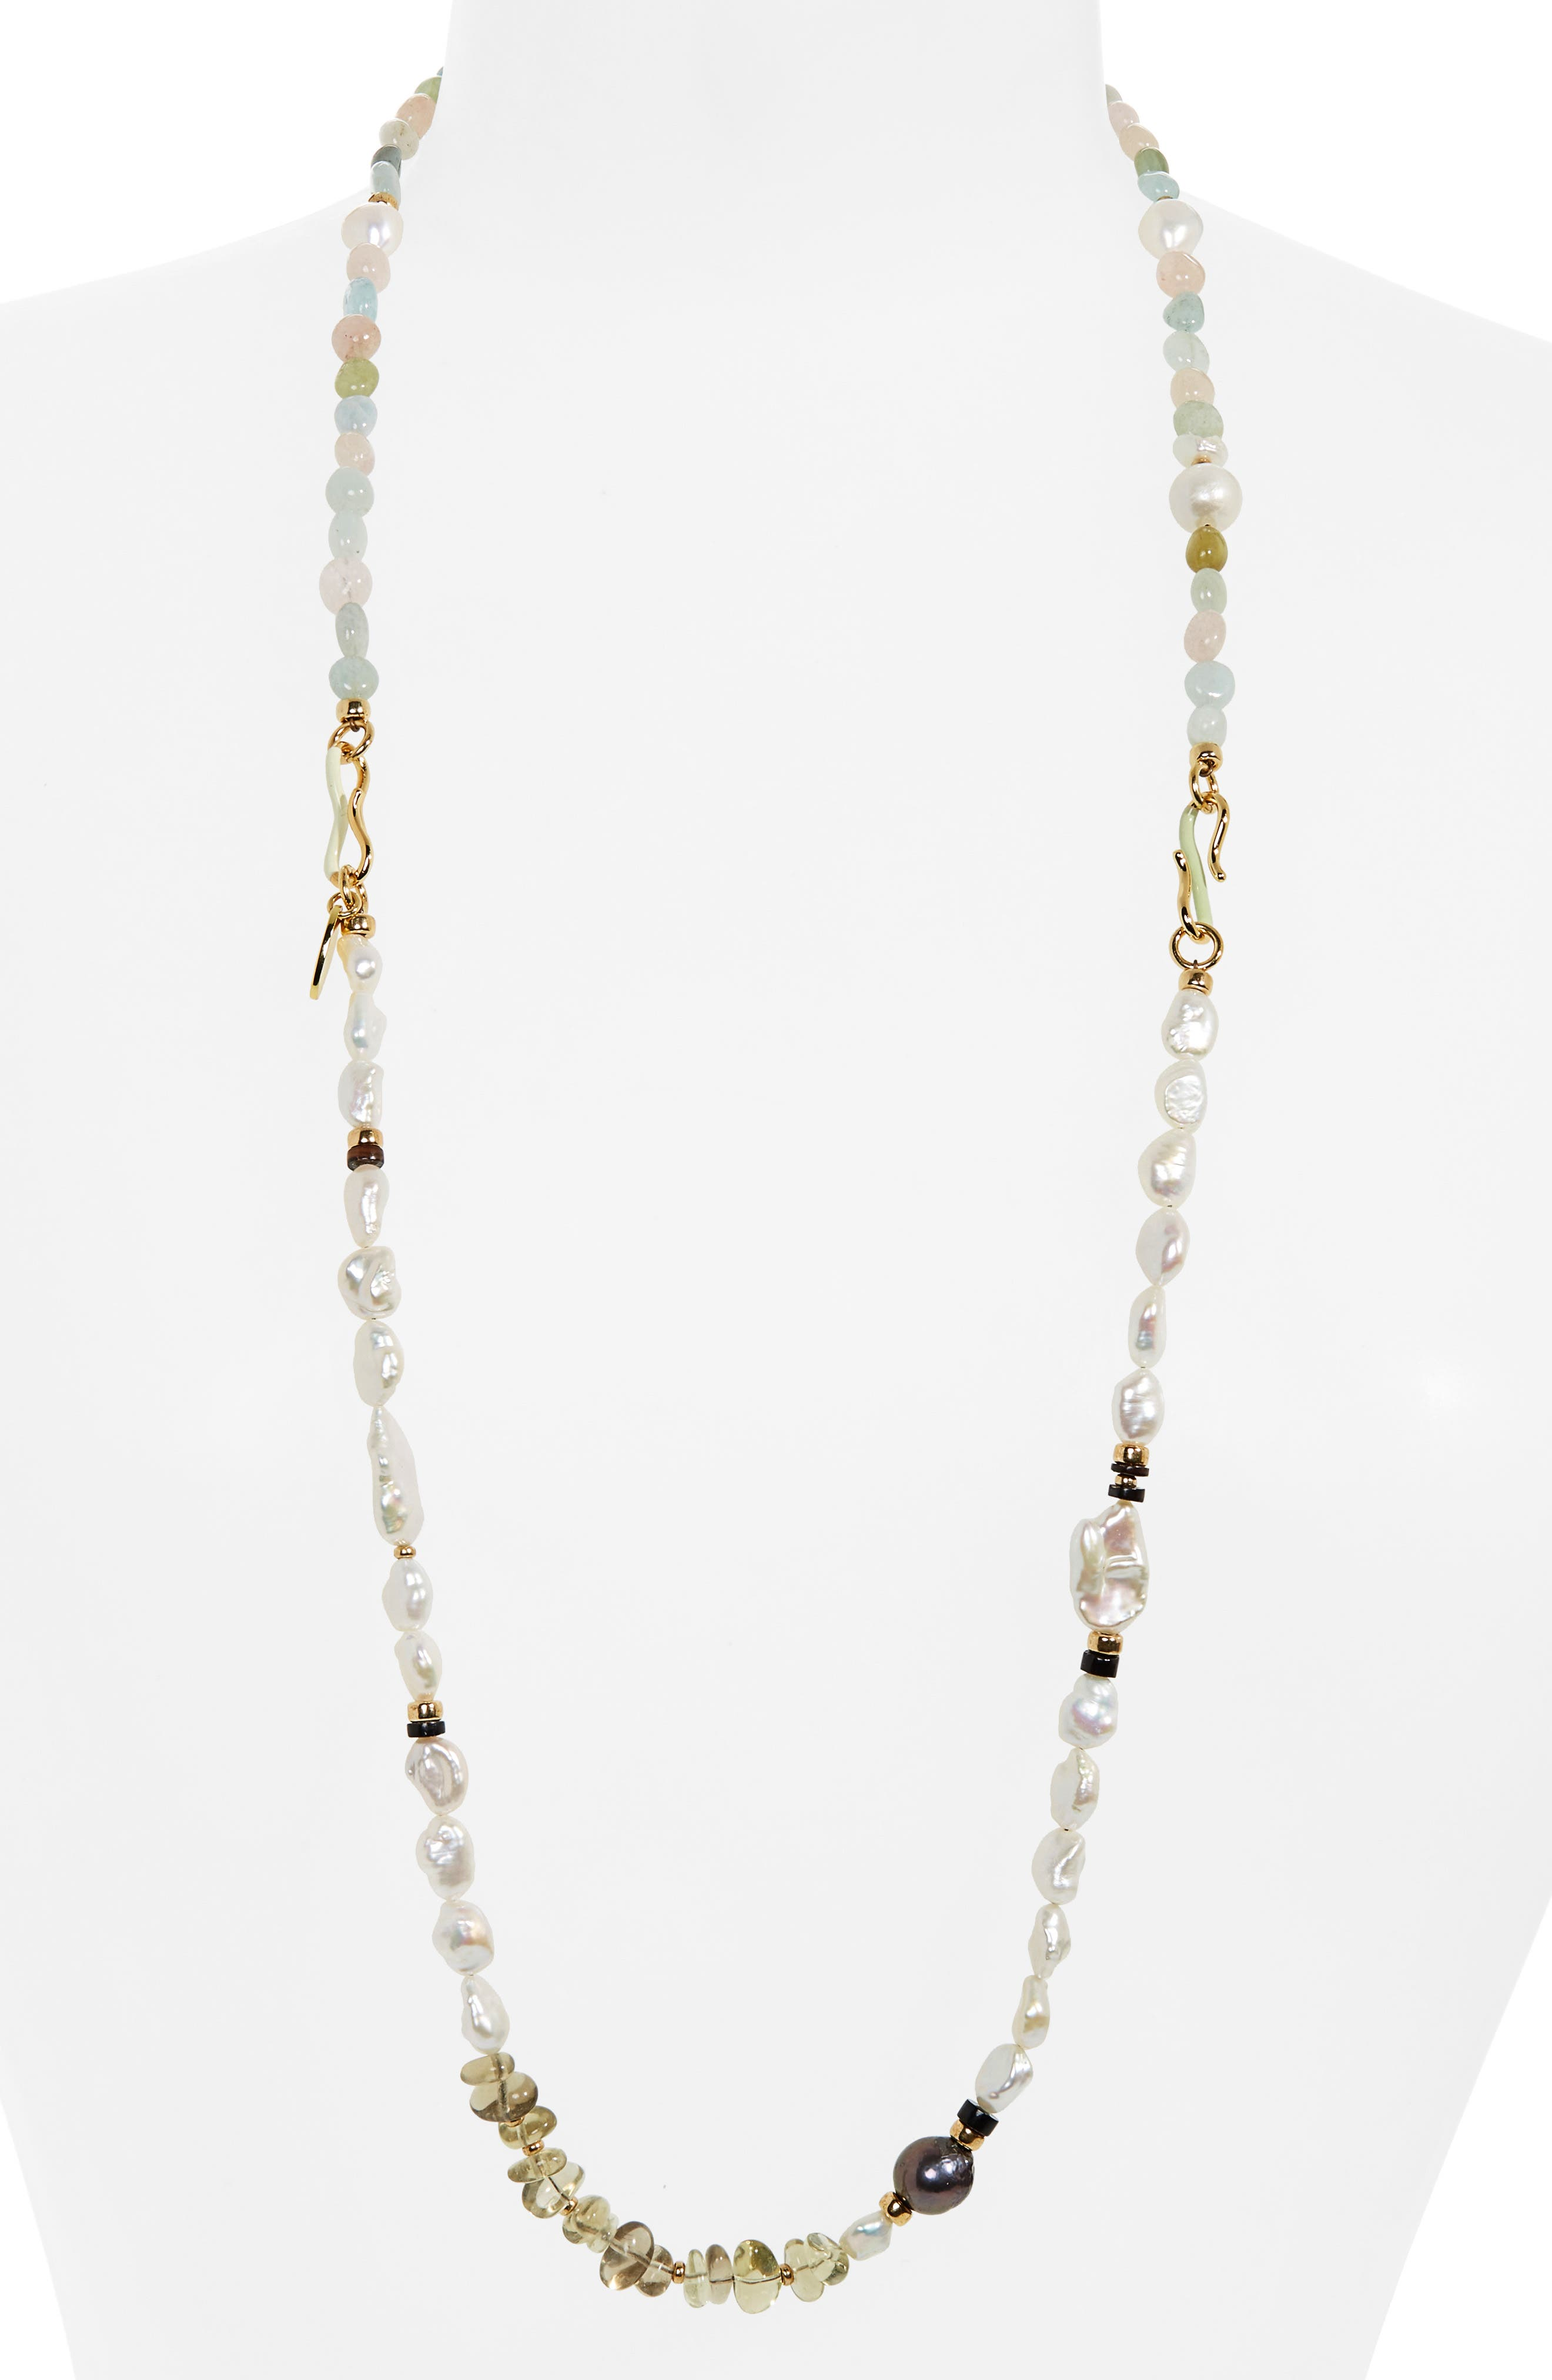 Cinq Set Of 2 Necklaces